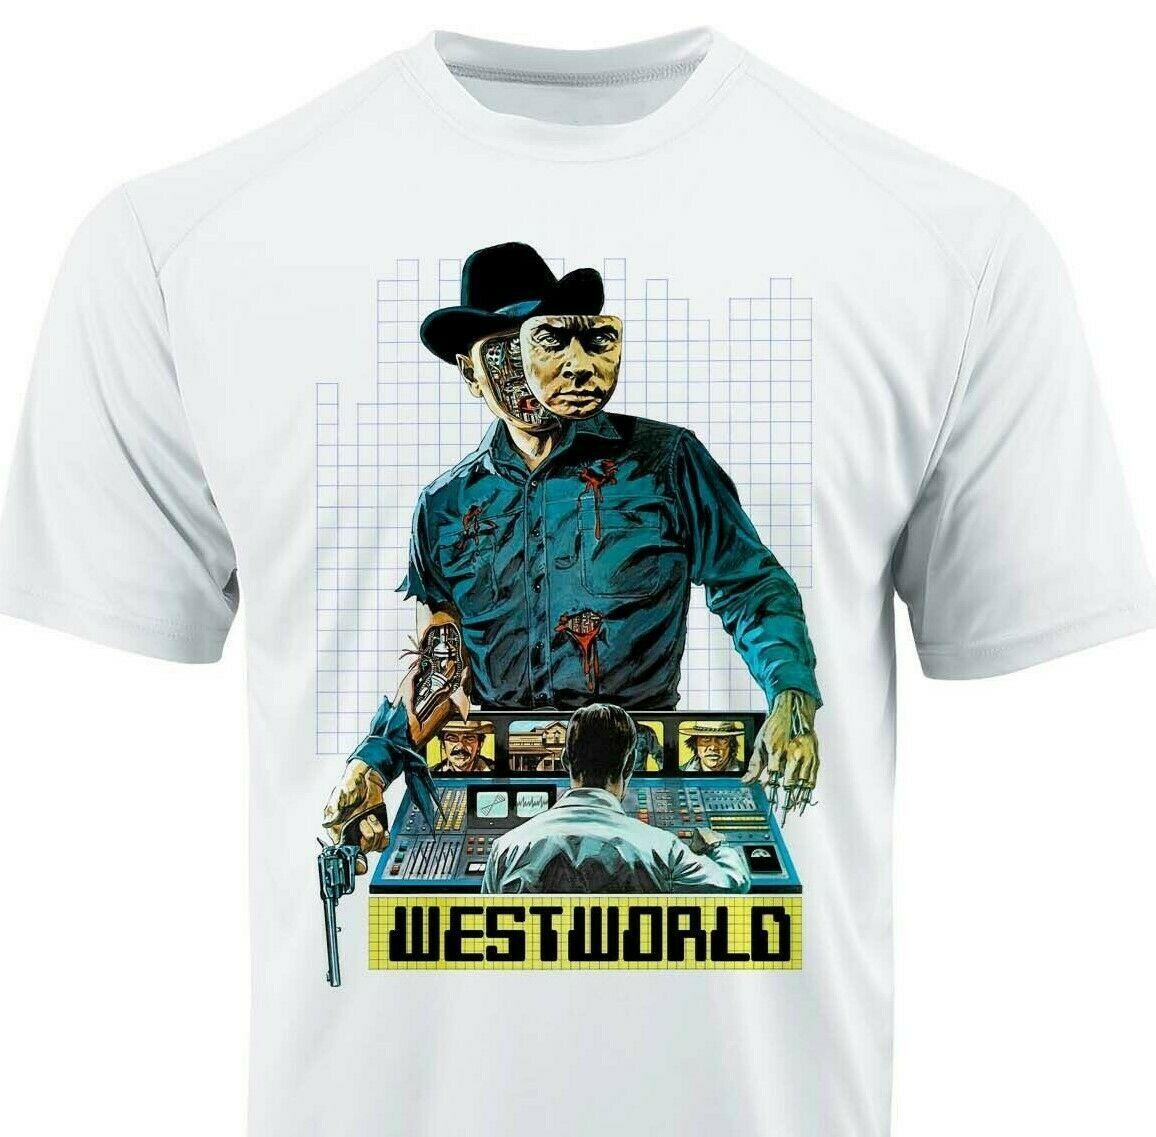 Westworld dri fit graphic tshirt moisture wicking superhero comic spf tee